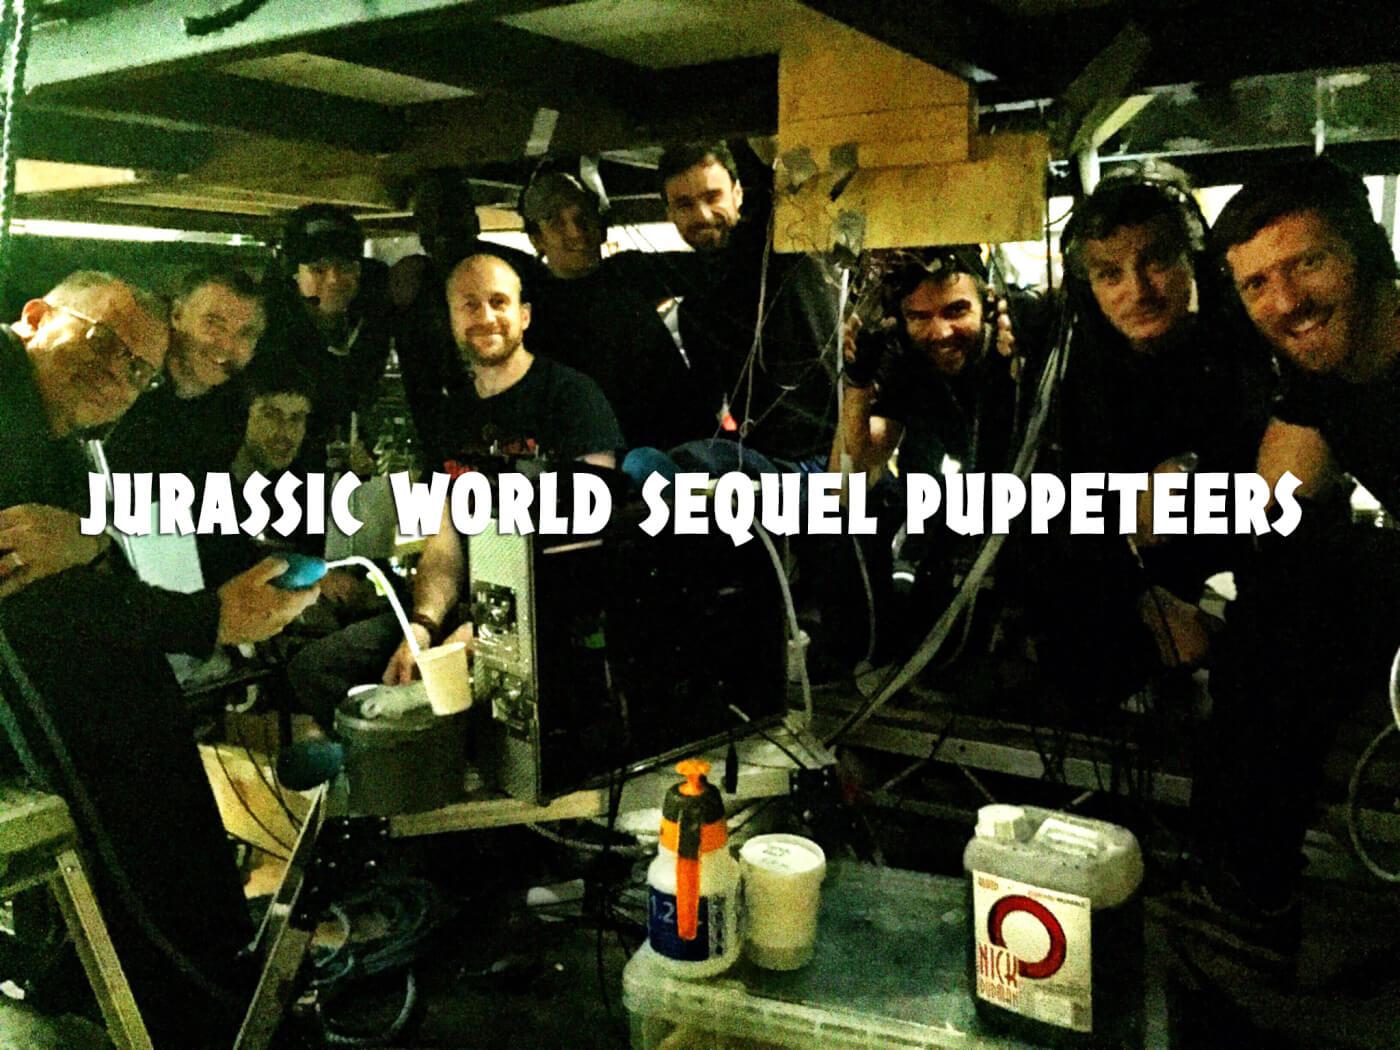 JA Bayona teases animatronics with photo of puppeteer team